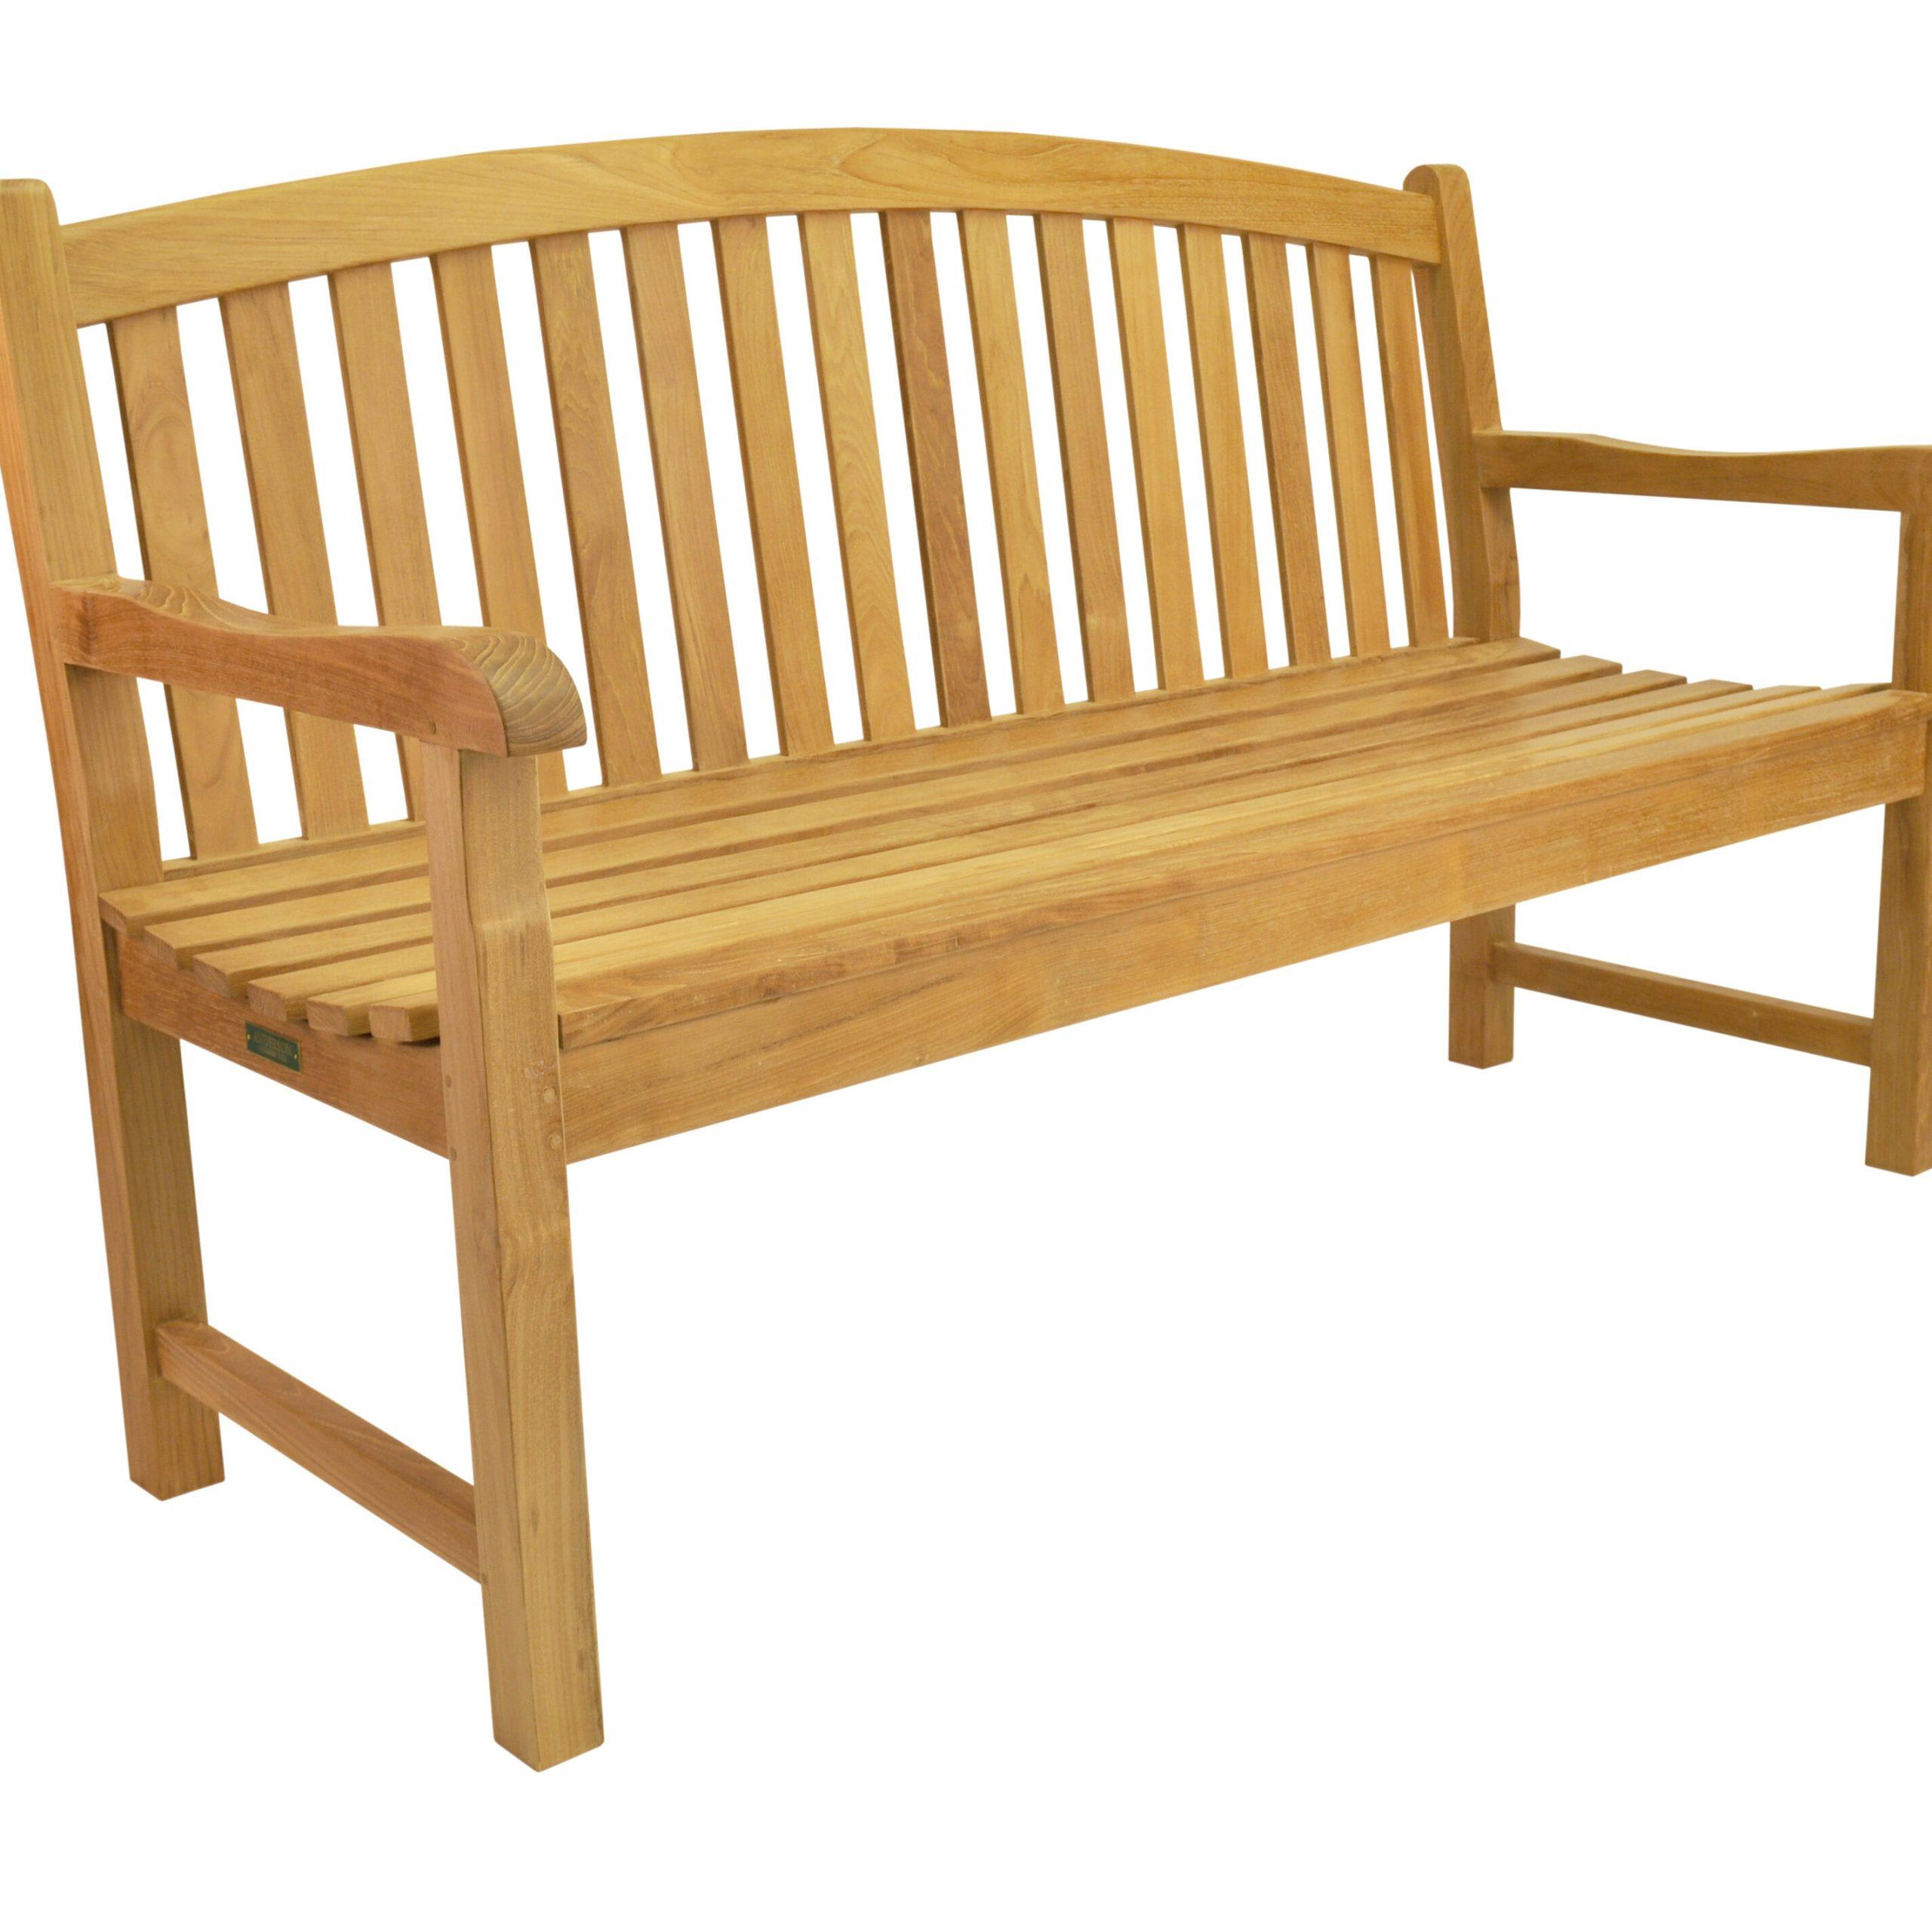 Chelsea Teak Garden Bench Intended For Wallie Teak Garden Benches (View 18 of 25)